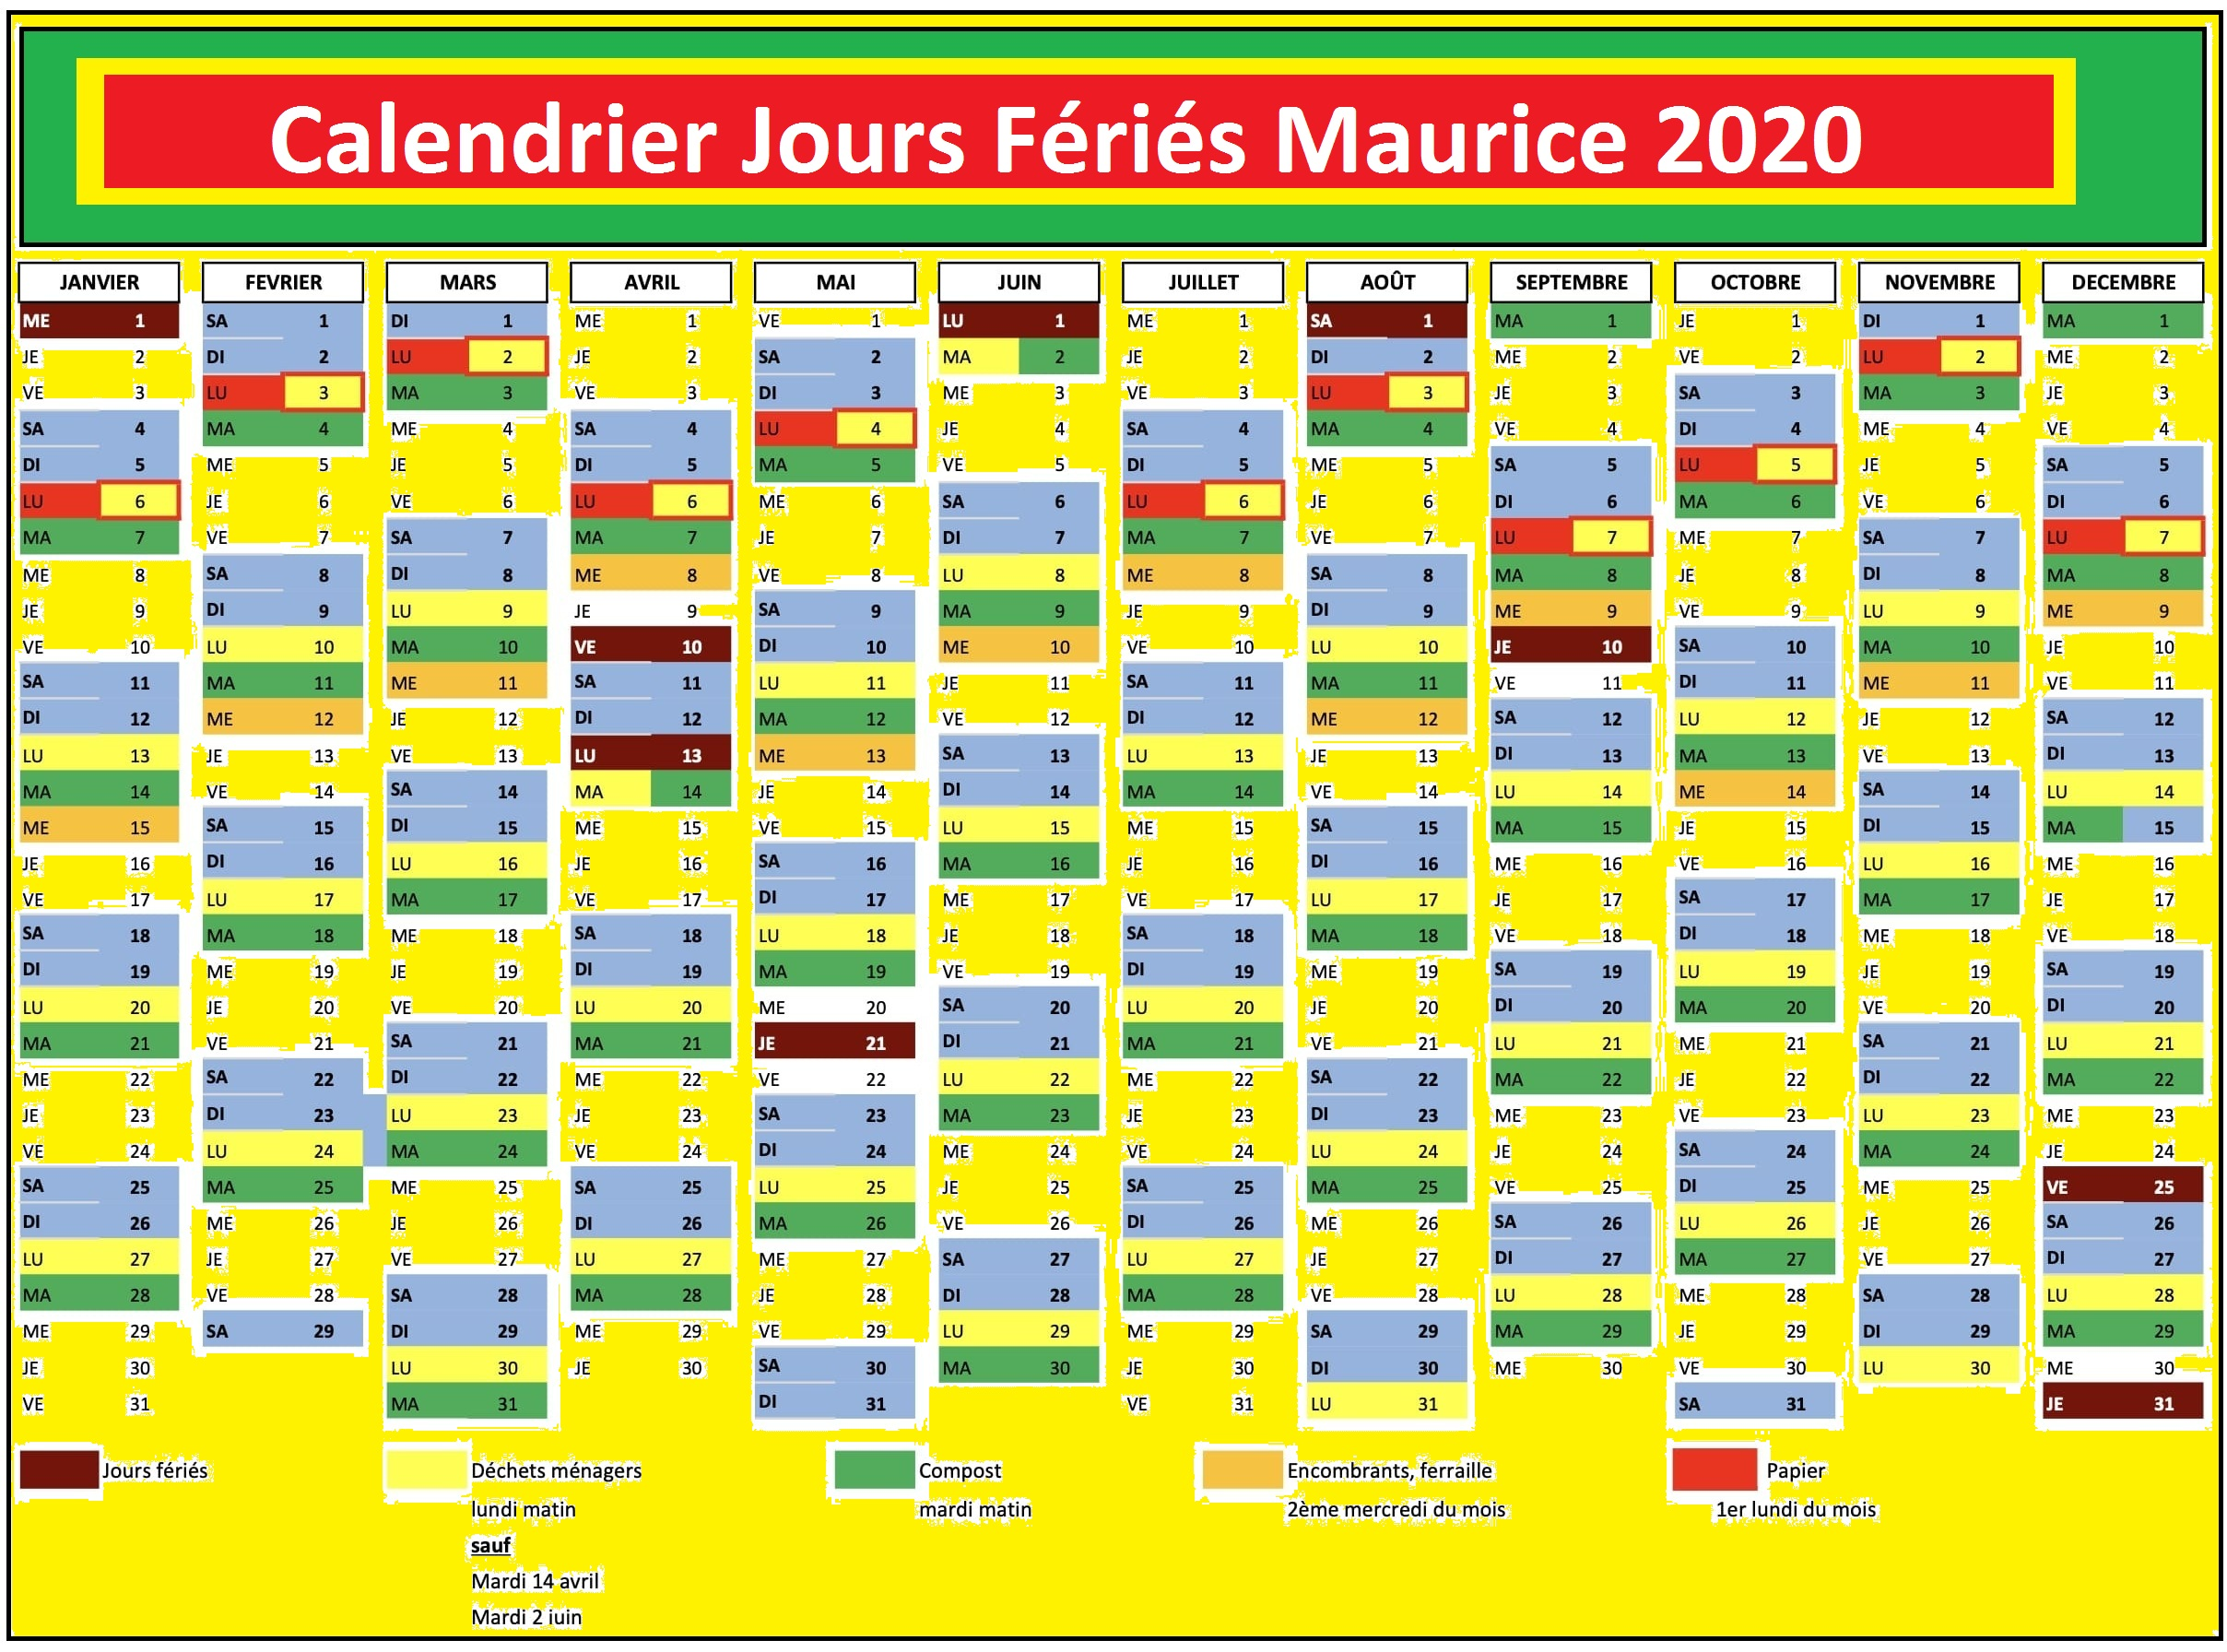 Jours Feries ile Maurice 2020